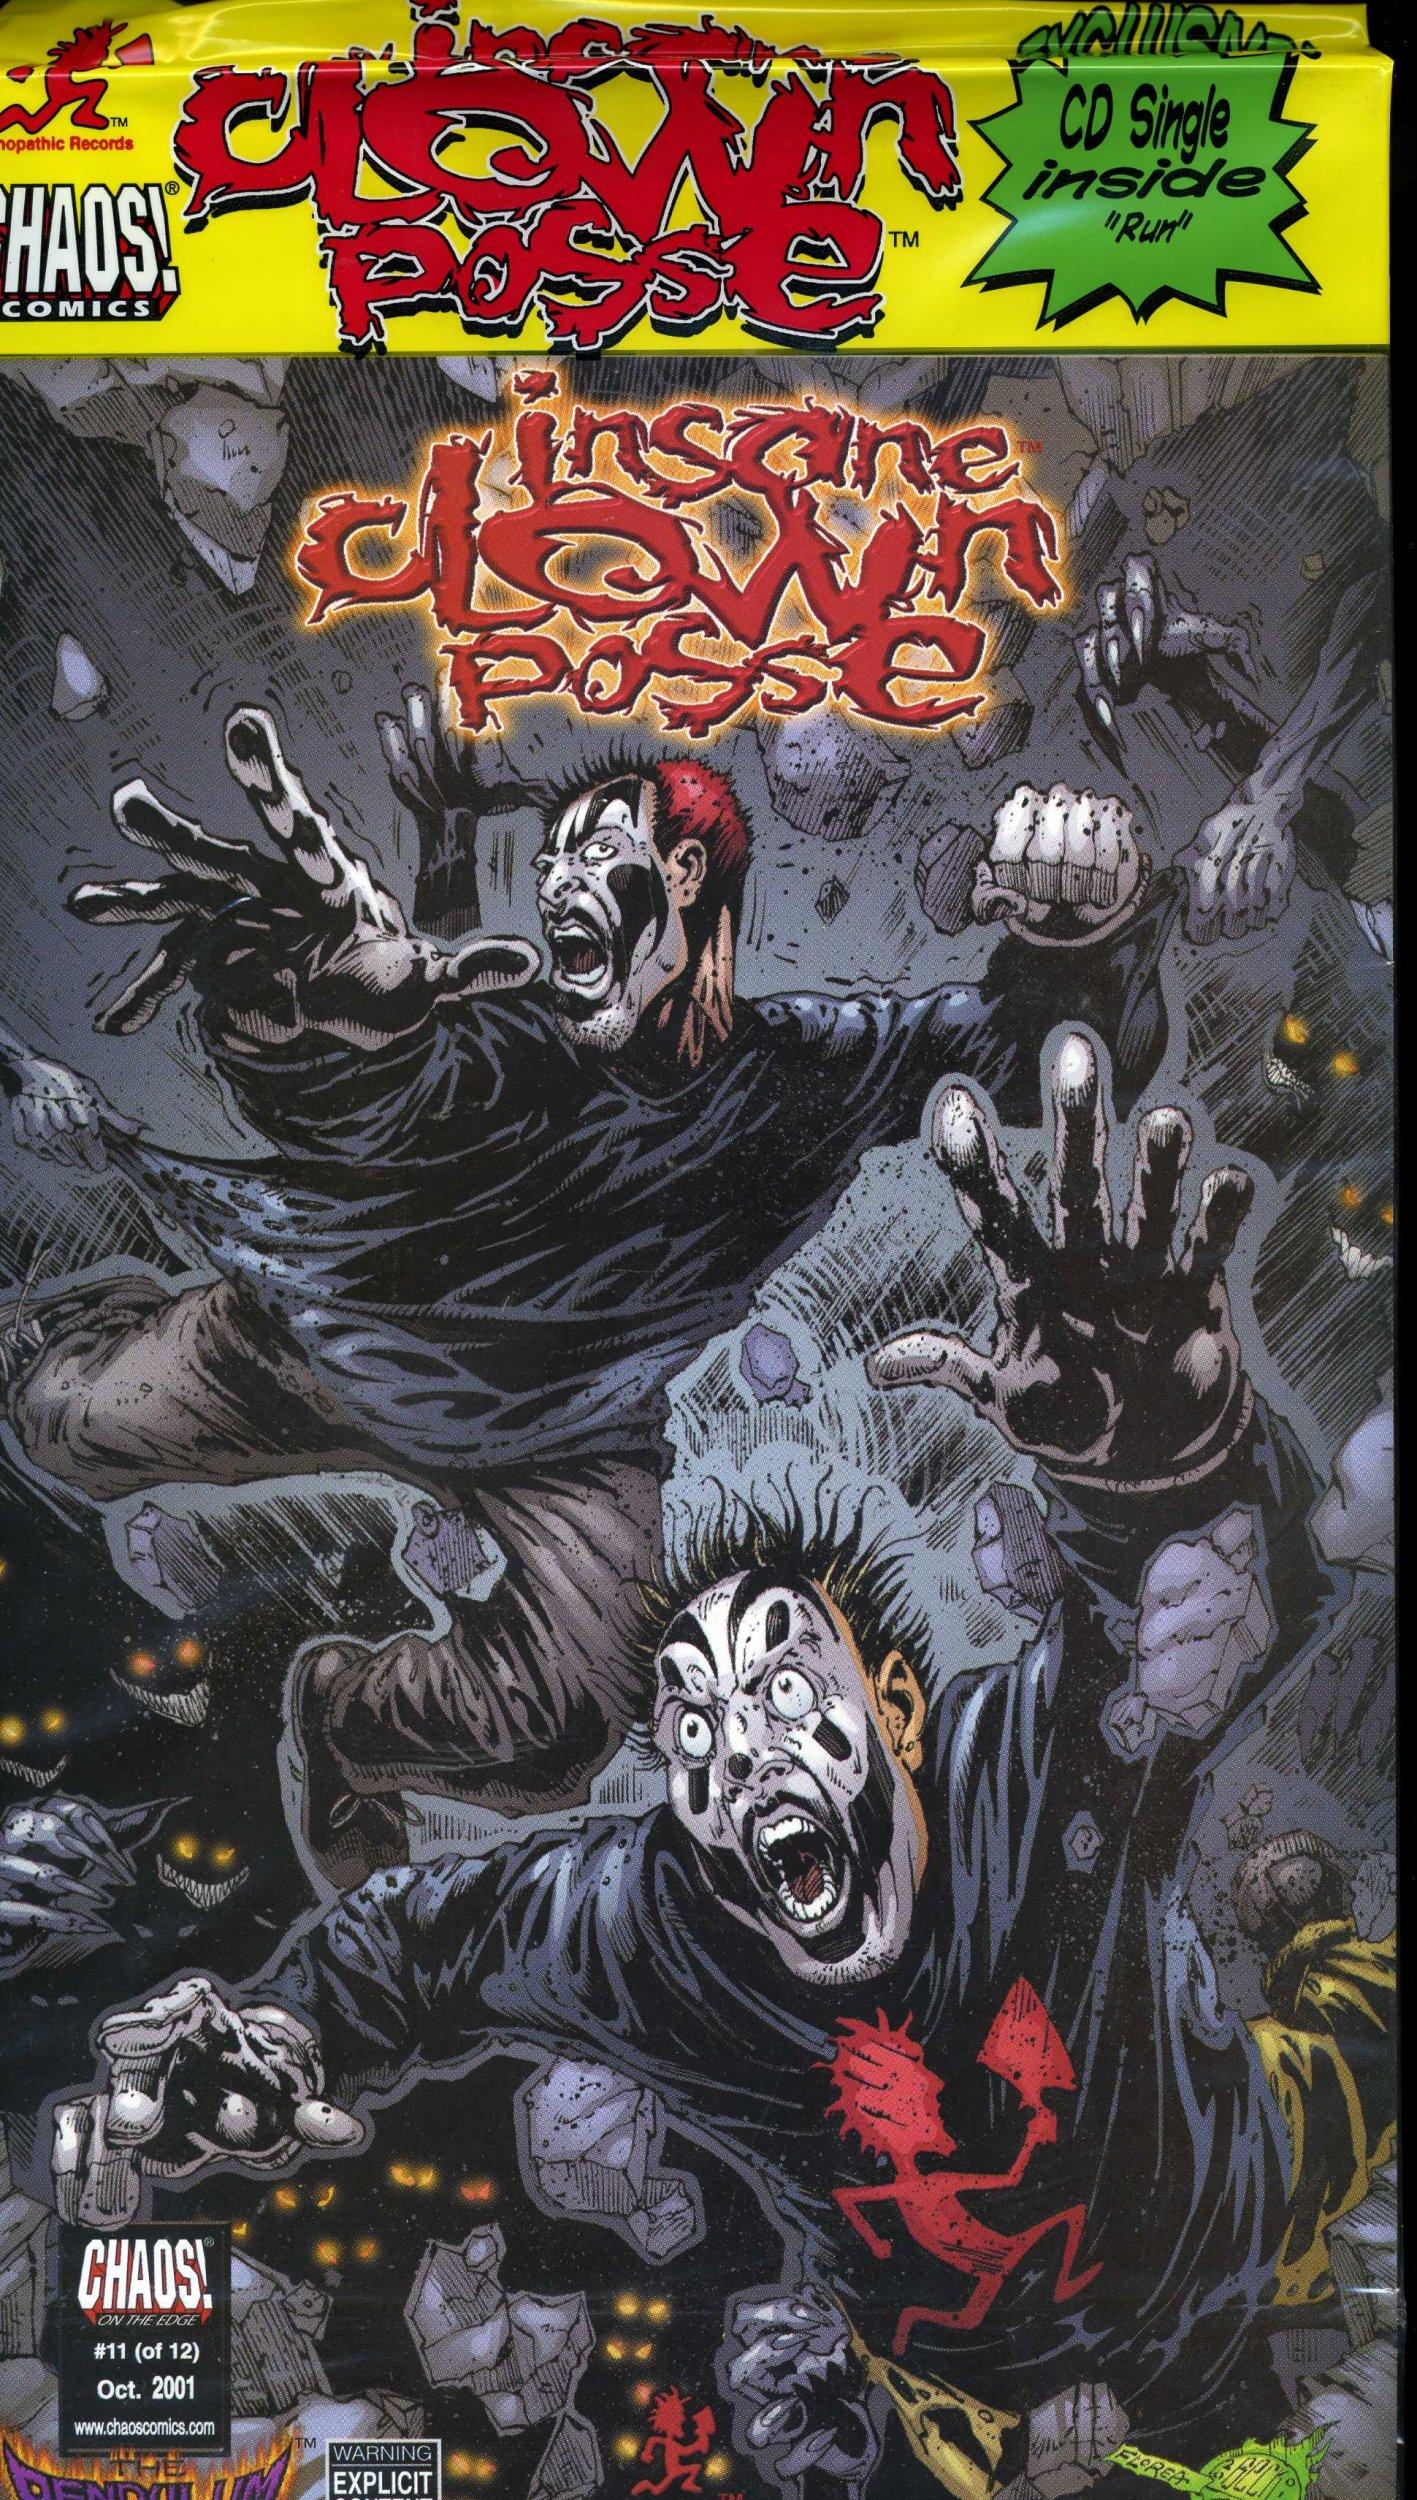 insane clown posse the pendulum 11 comic cd new icp jesse mccann